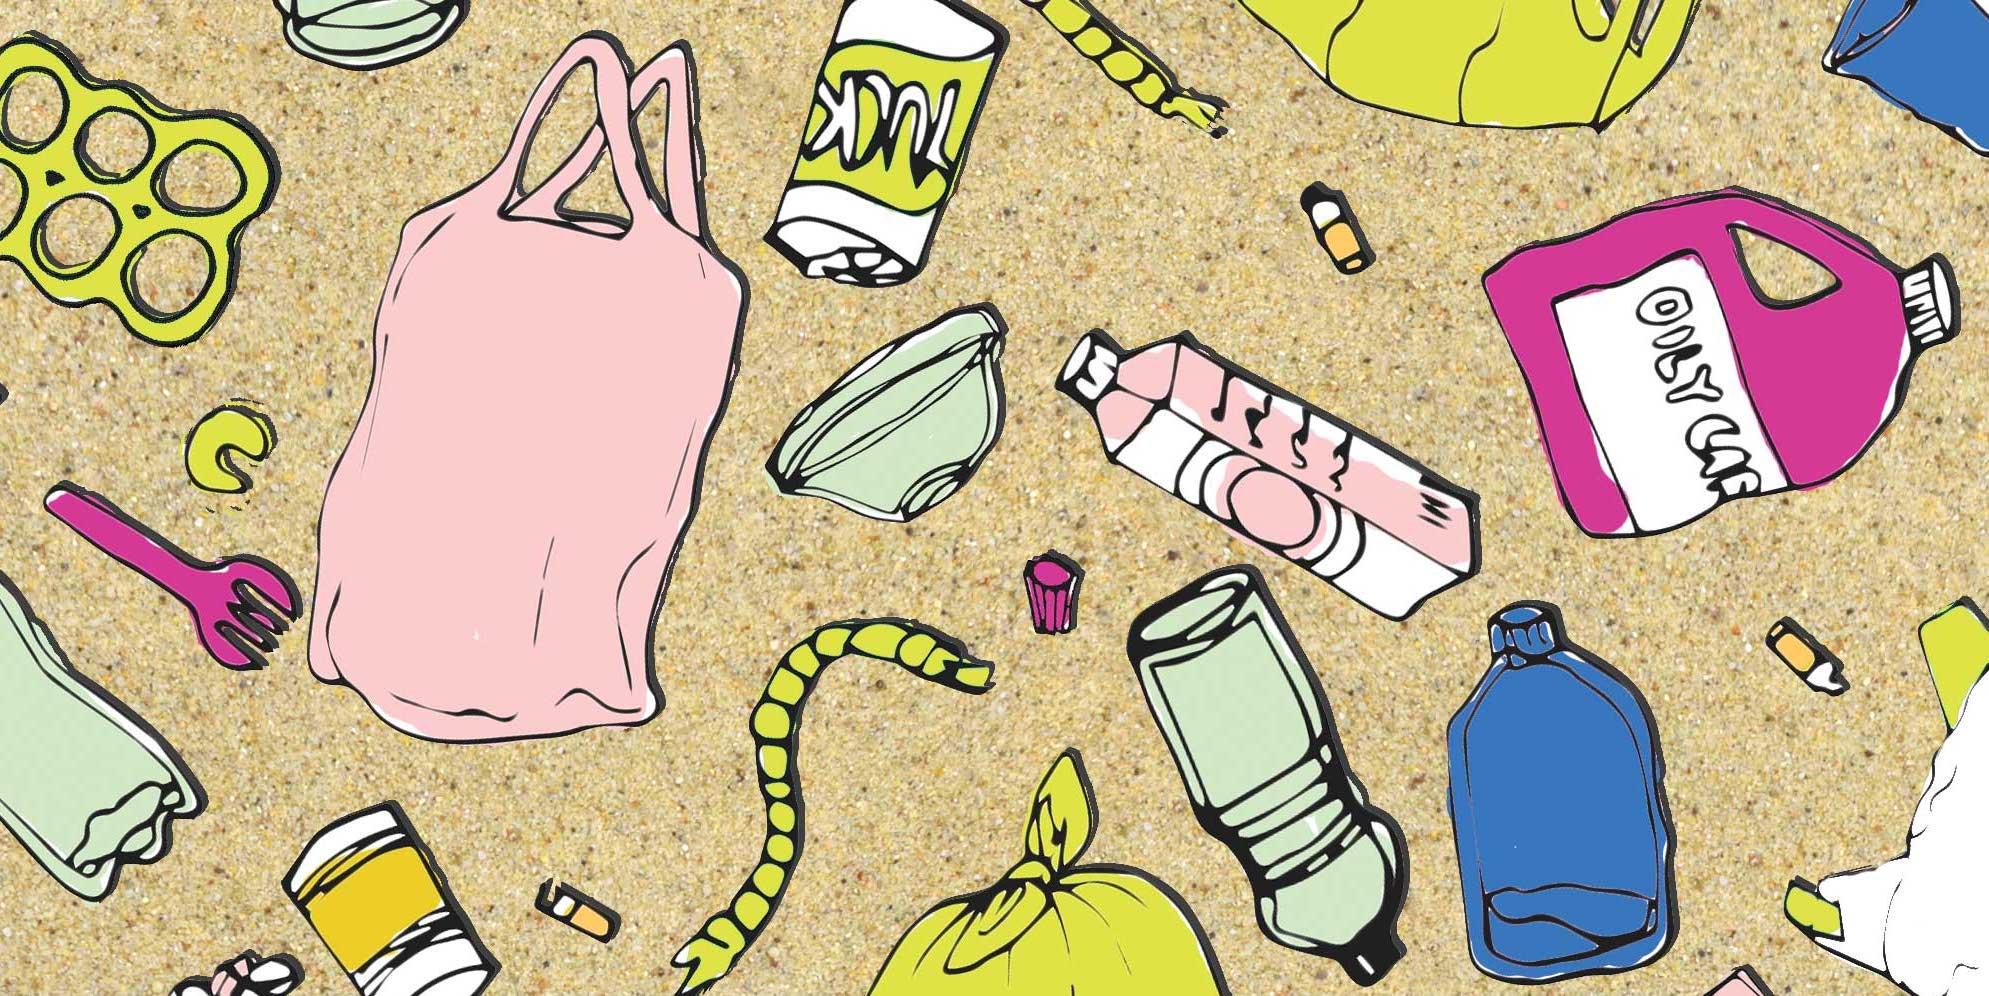 Illustration by Emily Chandler